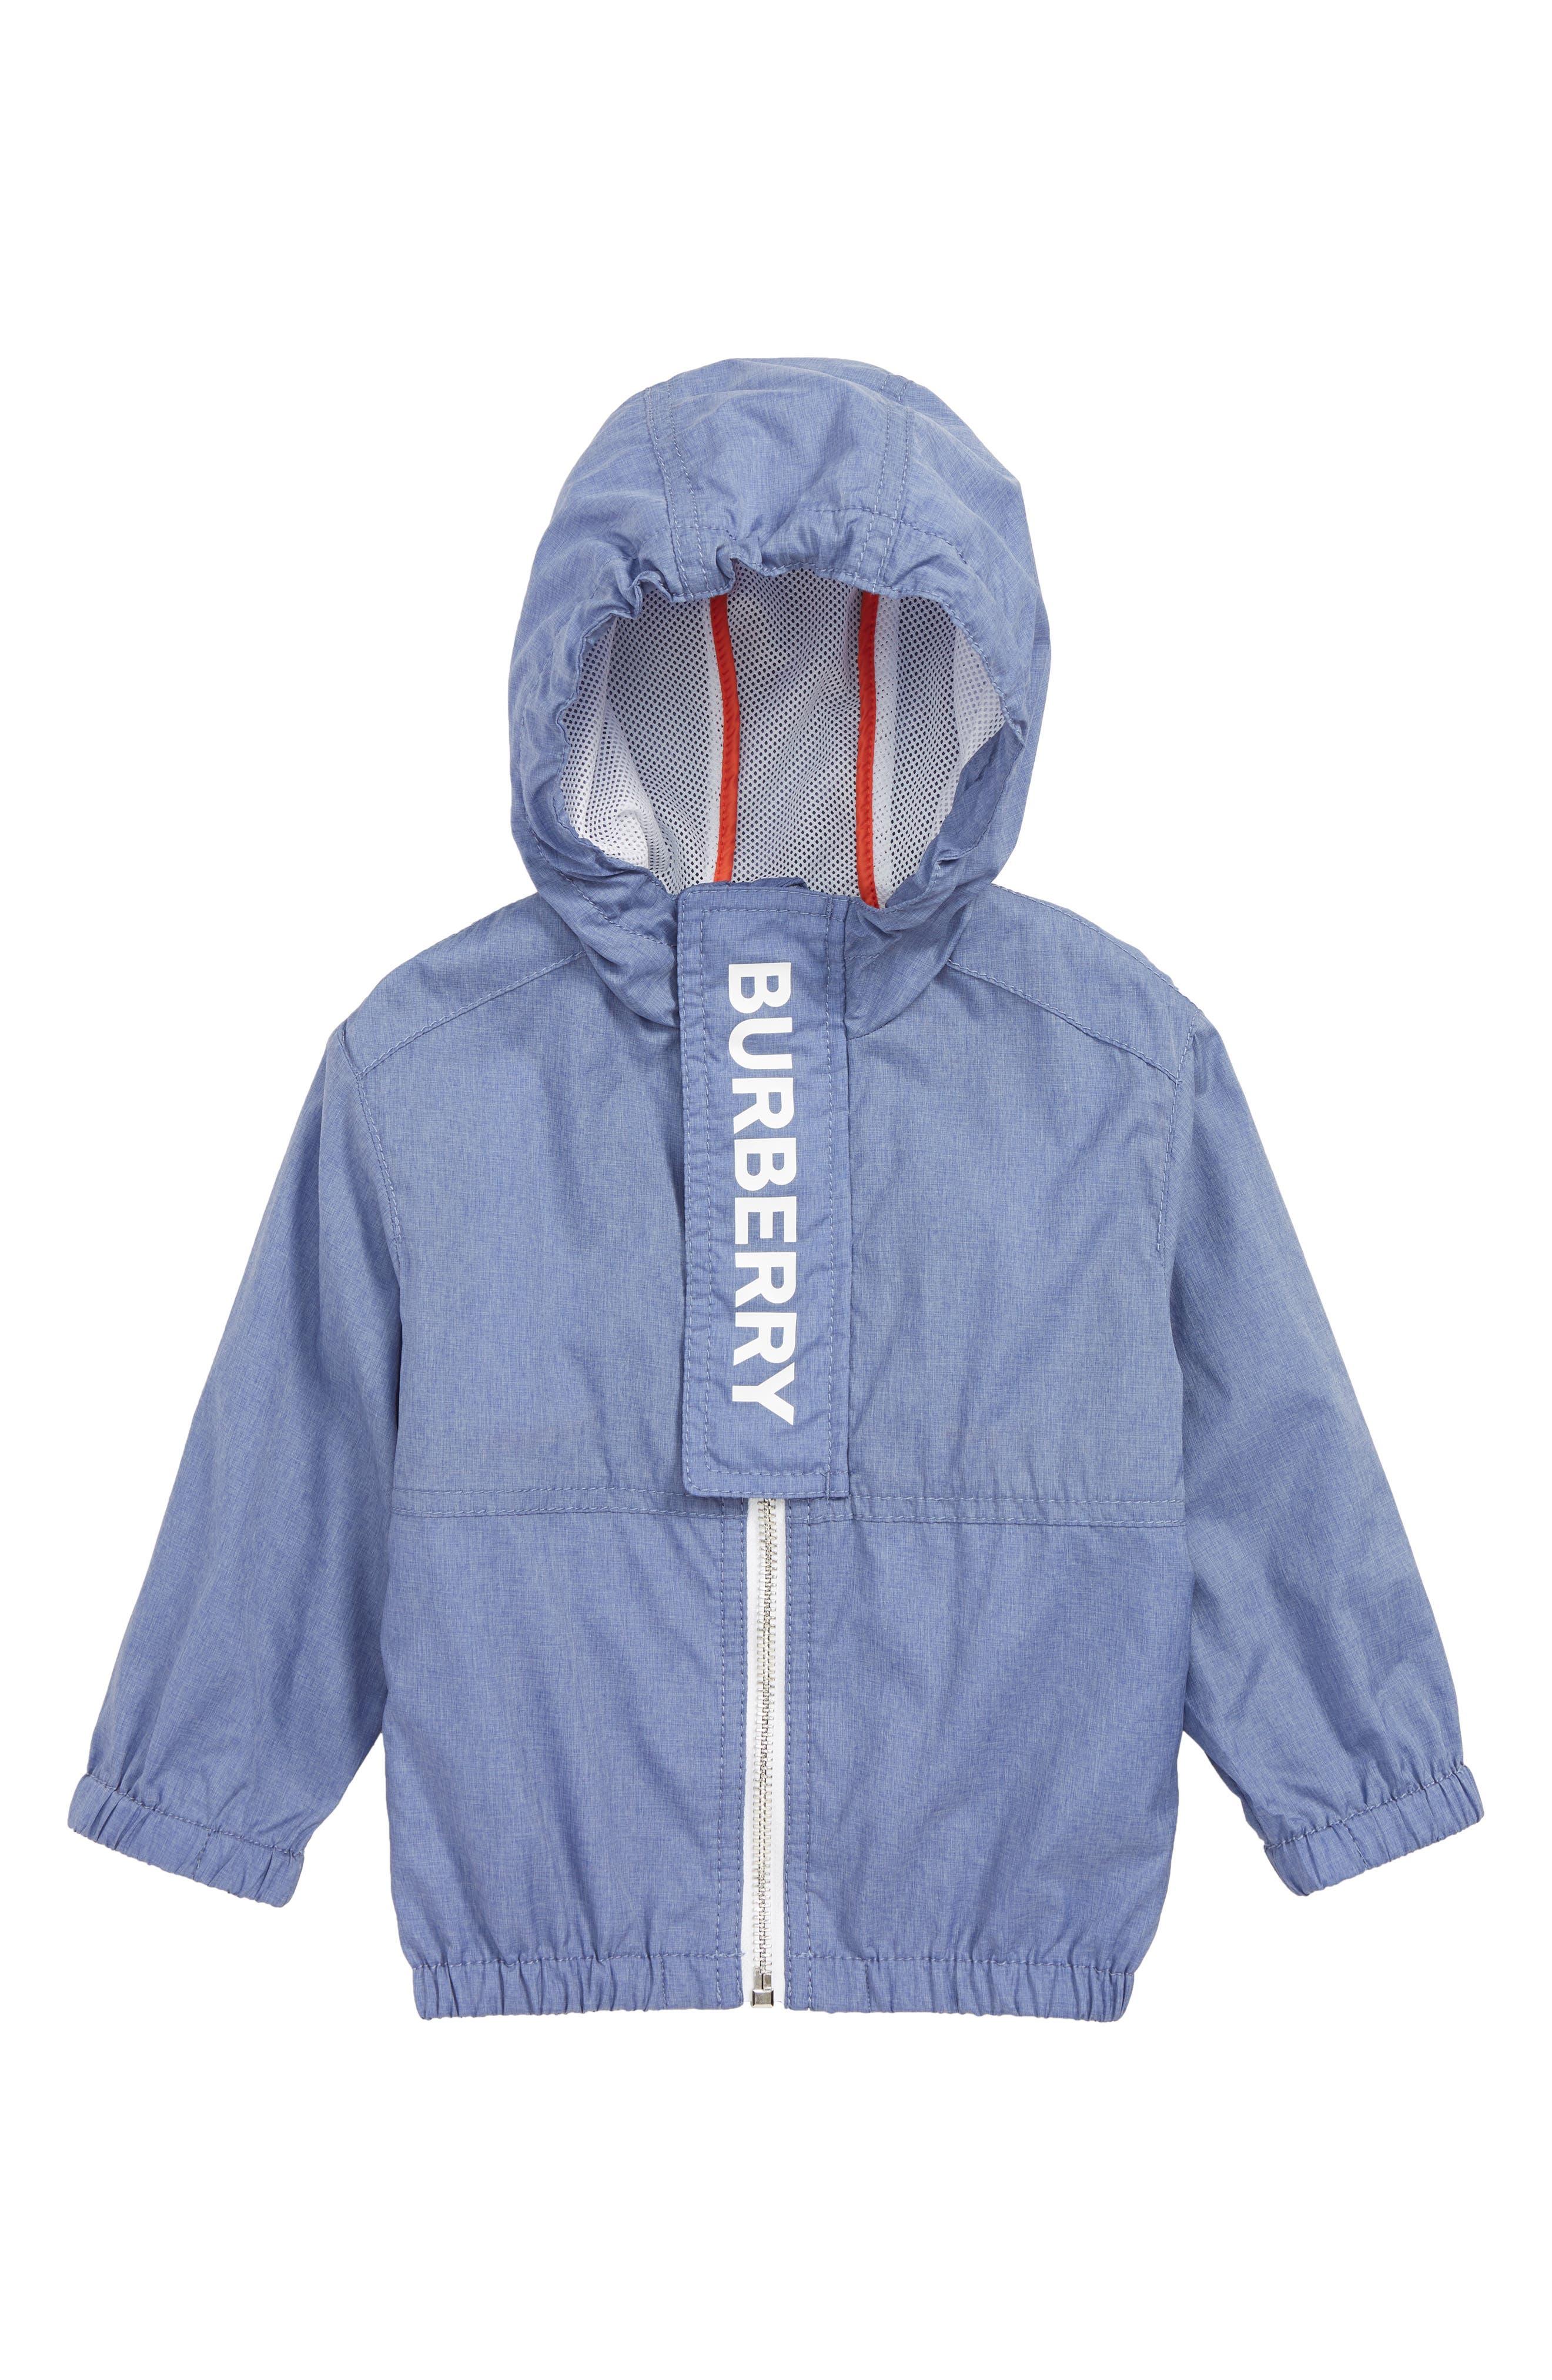 ebec850b4 Boys' Burberry Coats, Jackets & Outerwear   Nordstrom